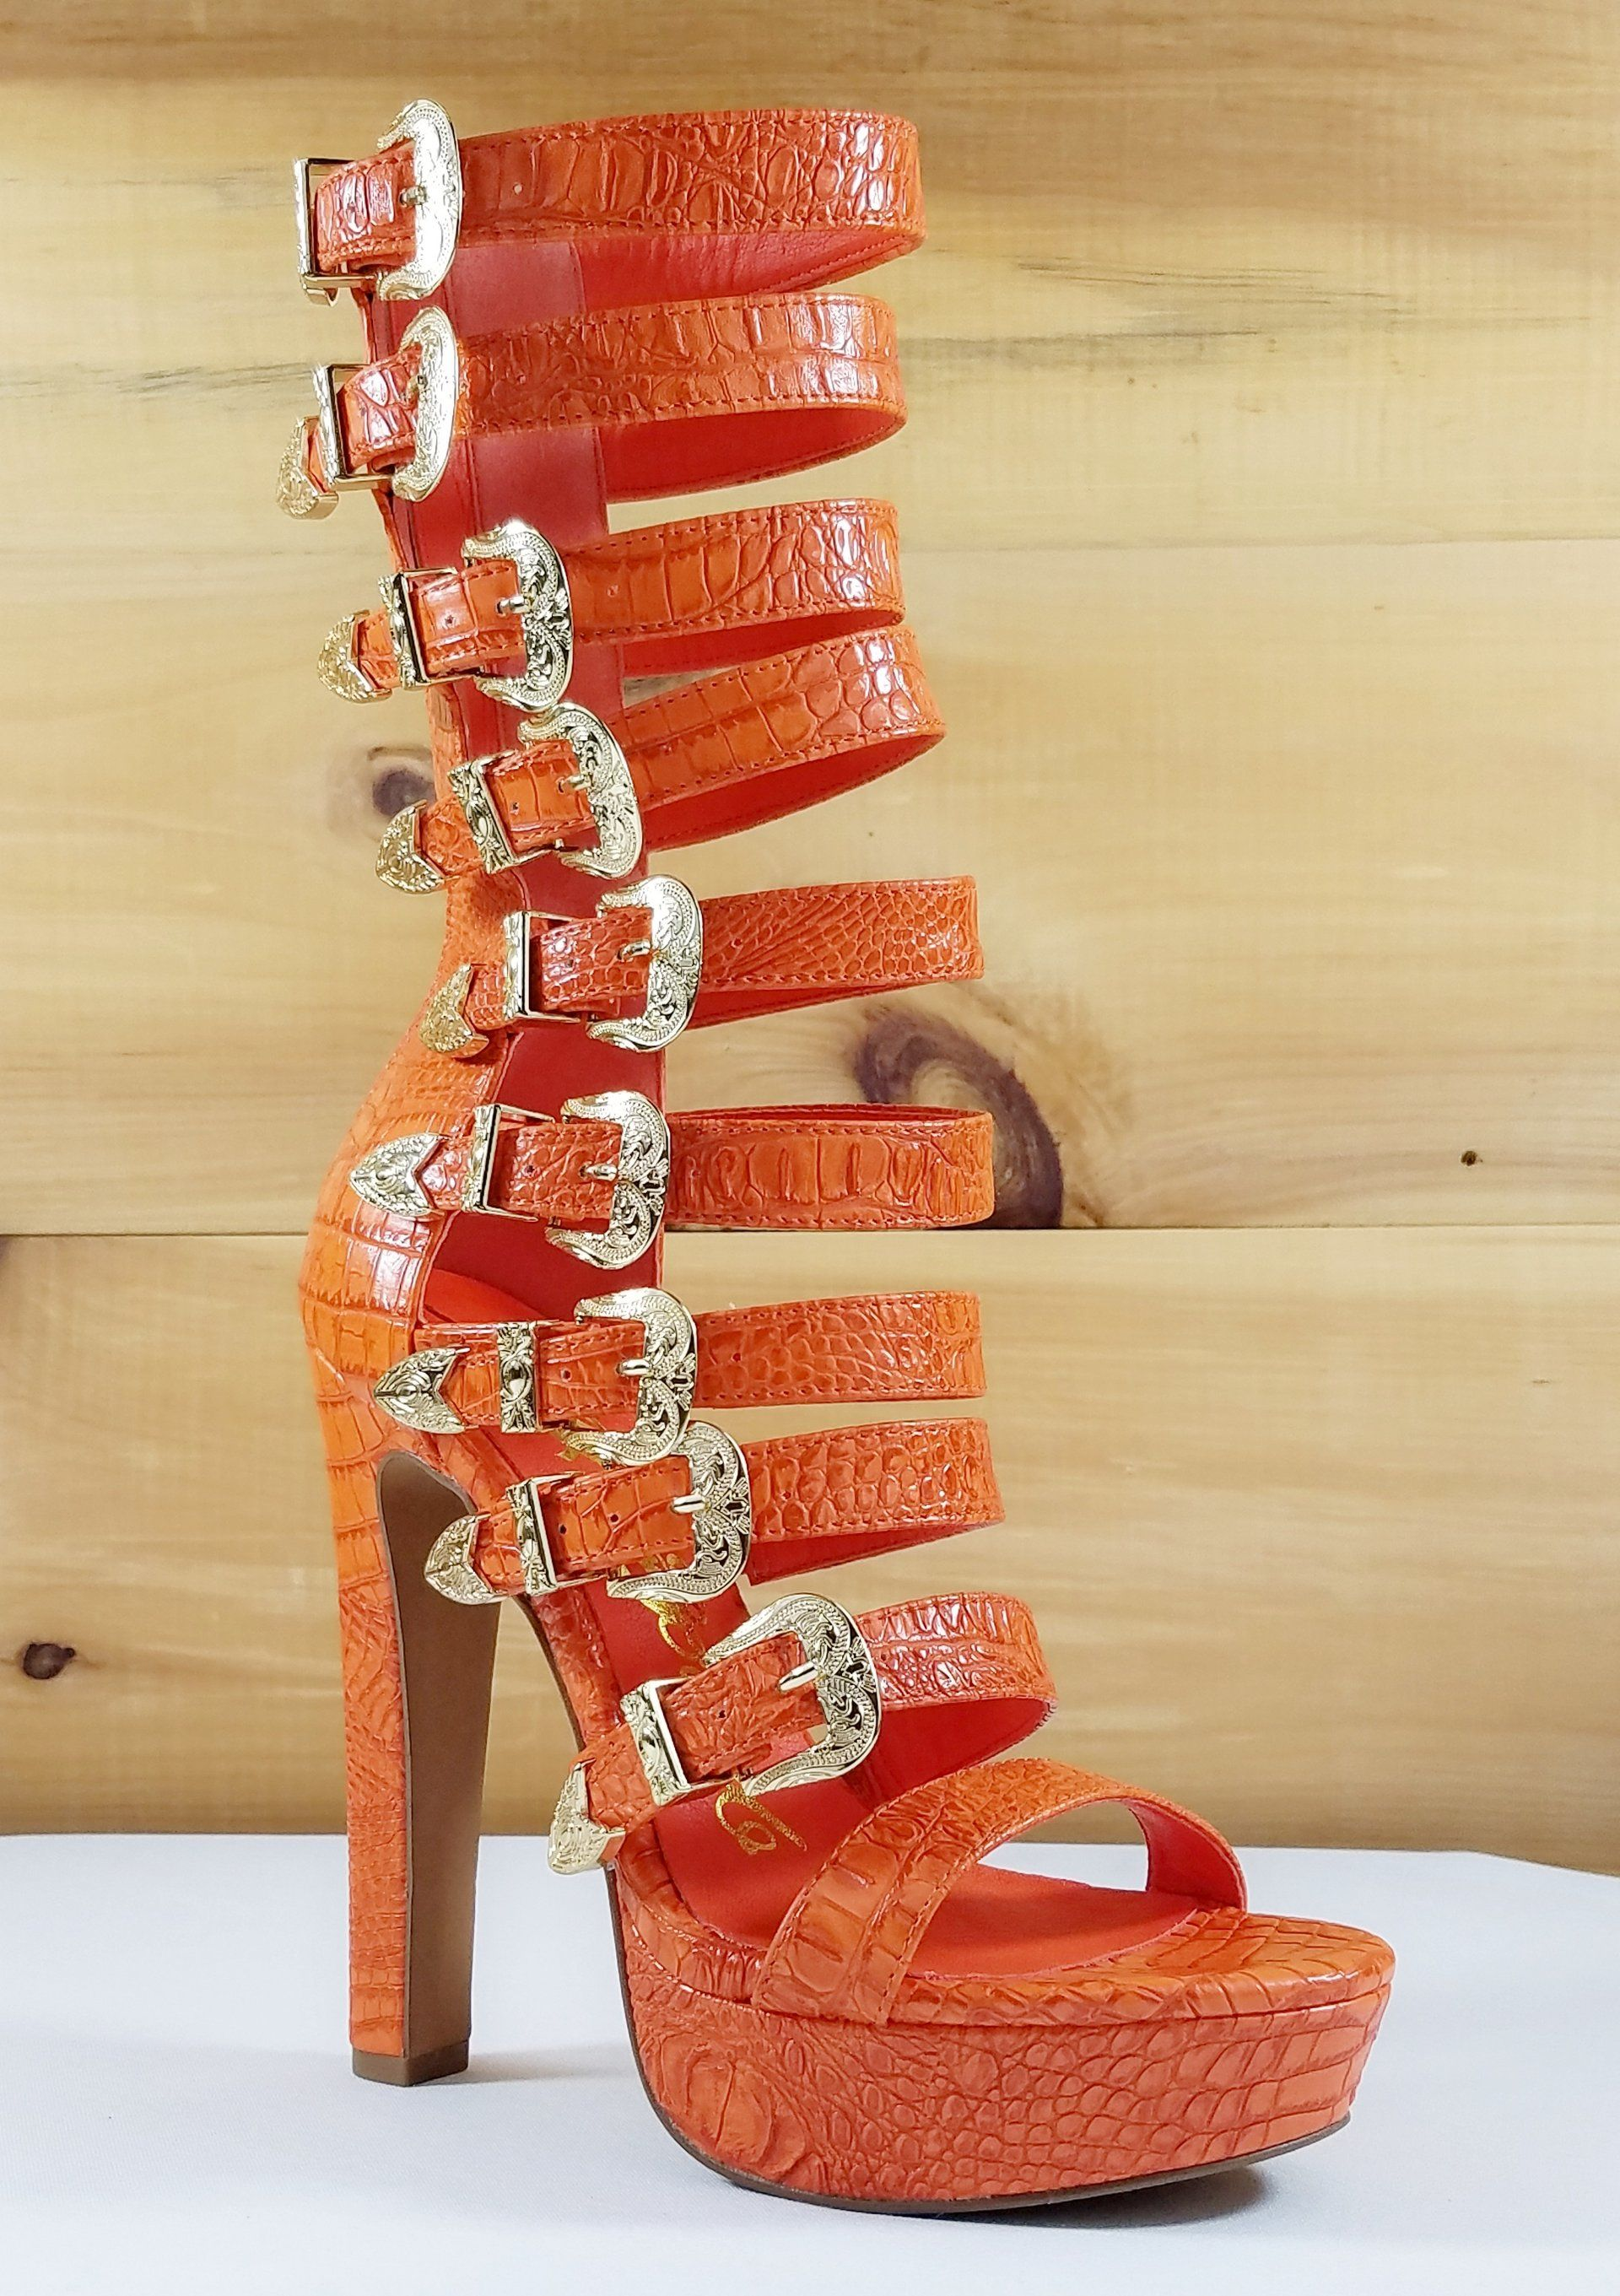 462d682b588 Draco Orange Multi Strap High Heel Platform Shoes - 5.5